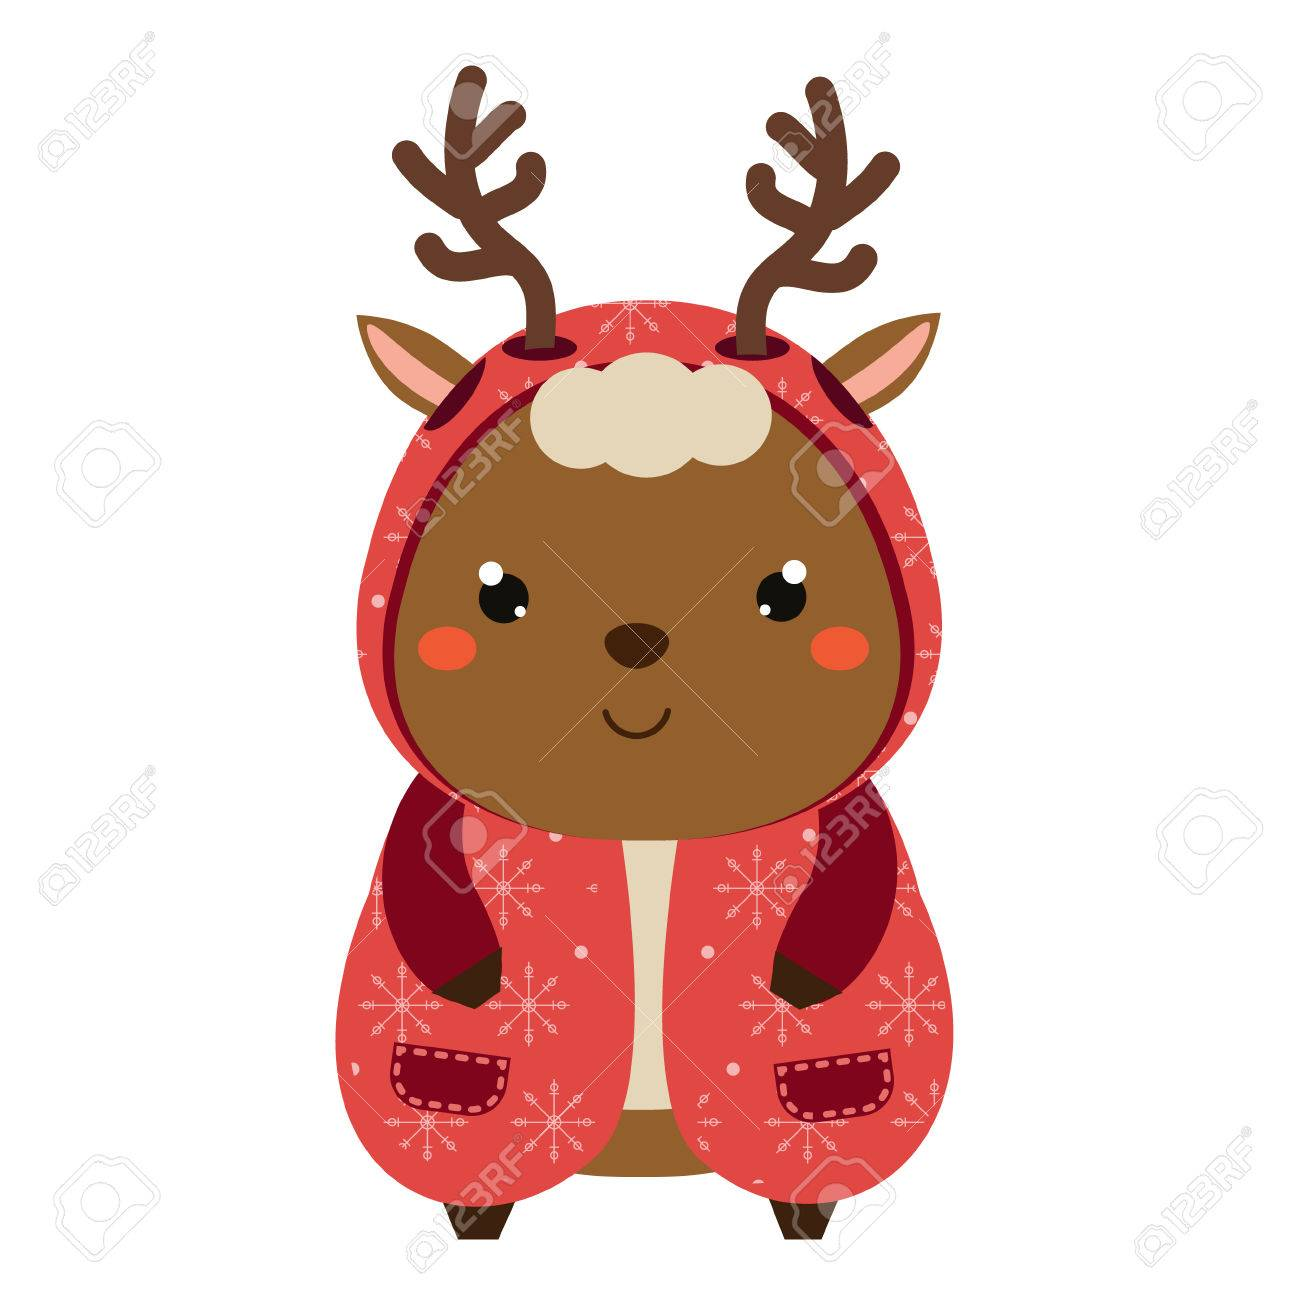 cute reindeer in knitted coat cartoon kawaii animal character rh 123rf com free cute reindeer clipart